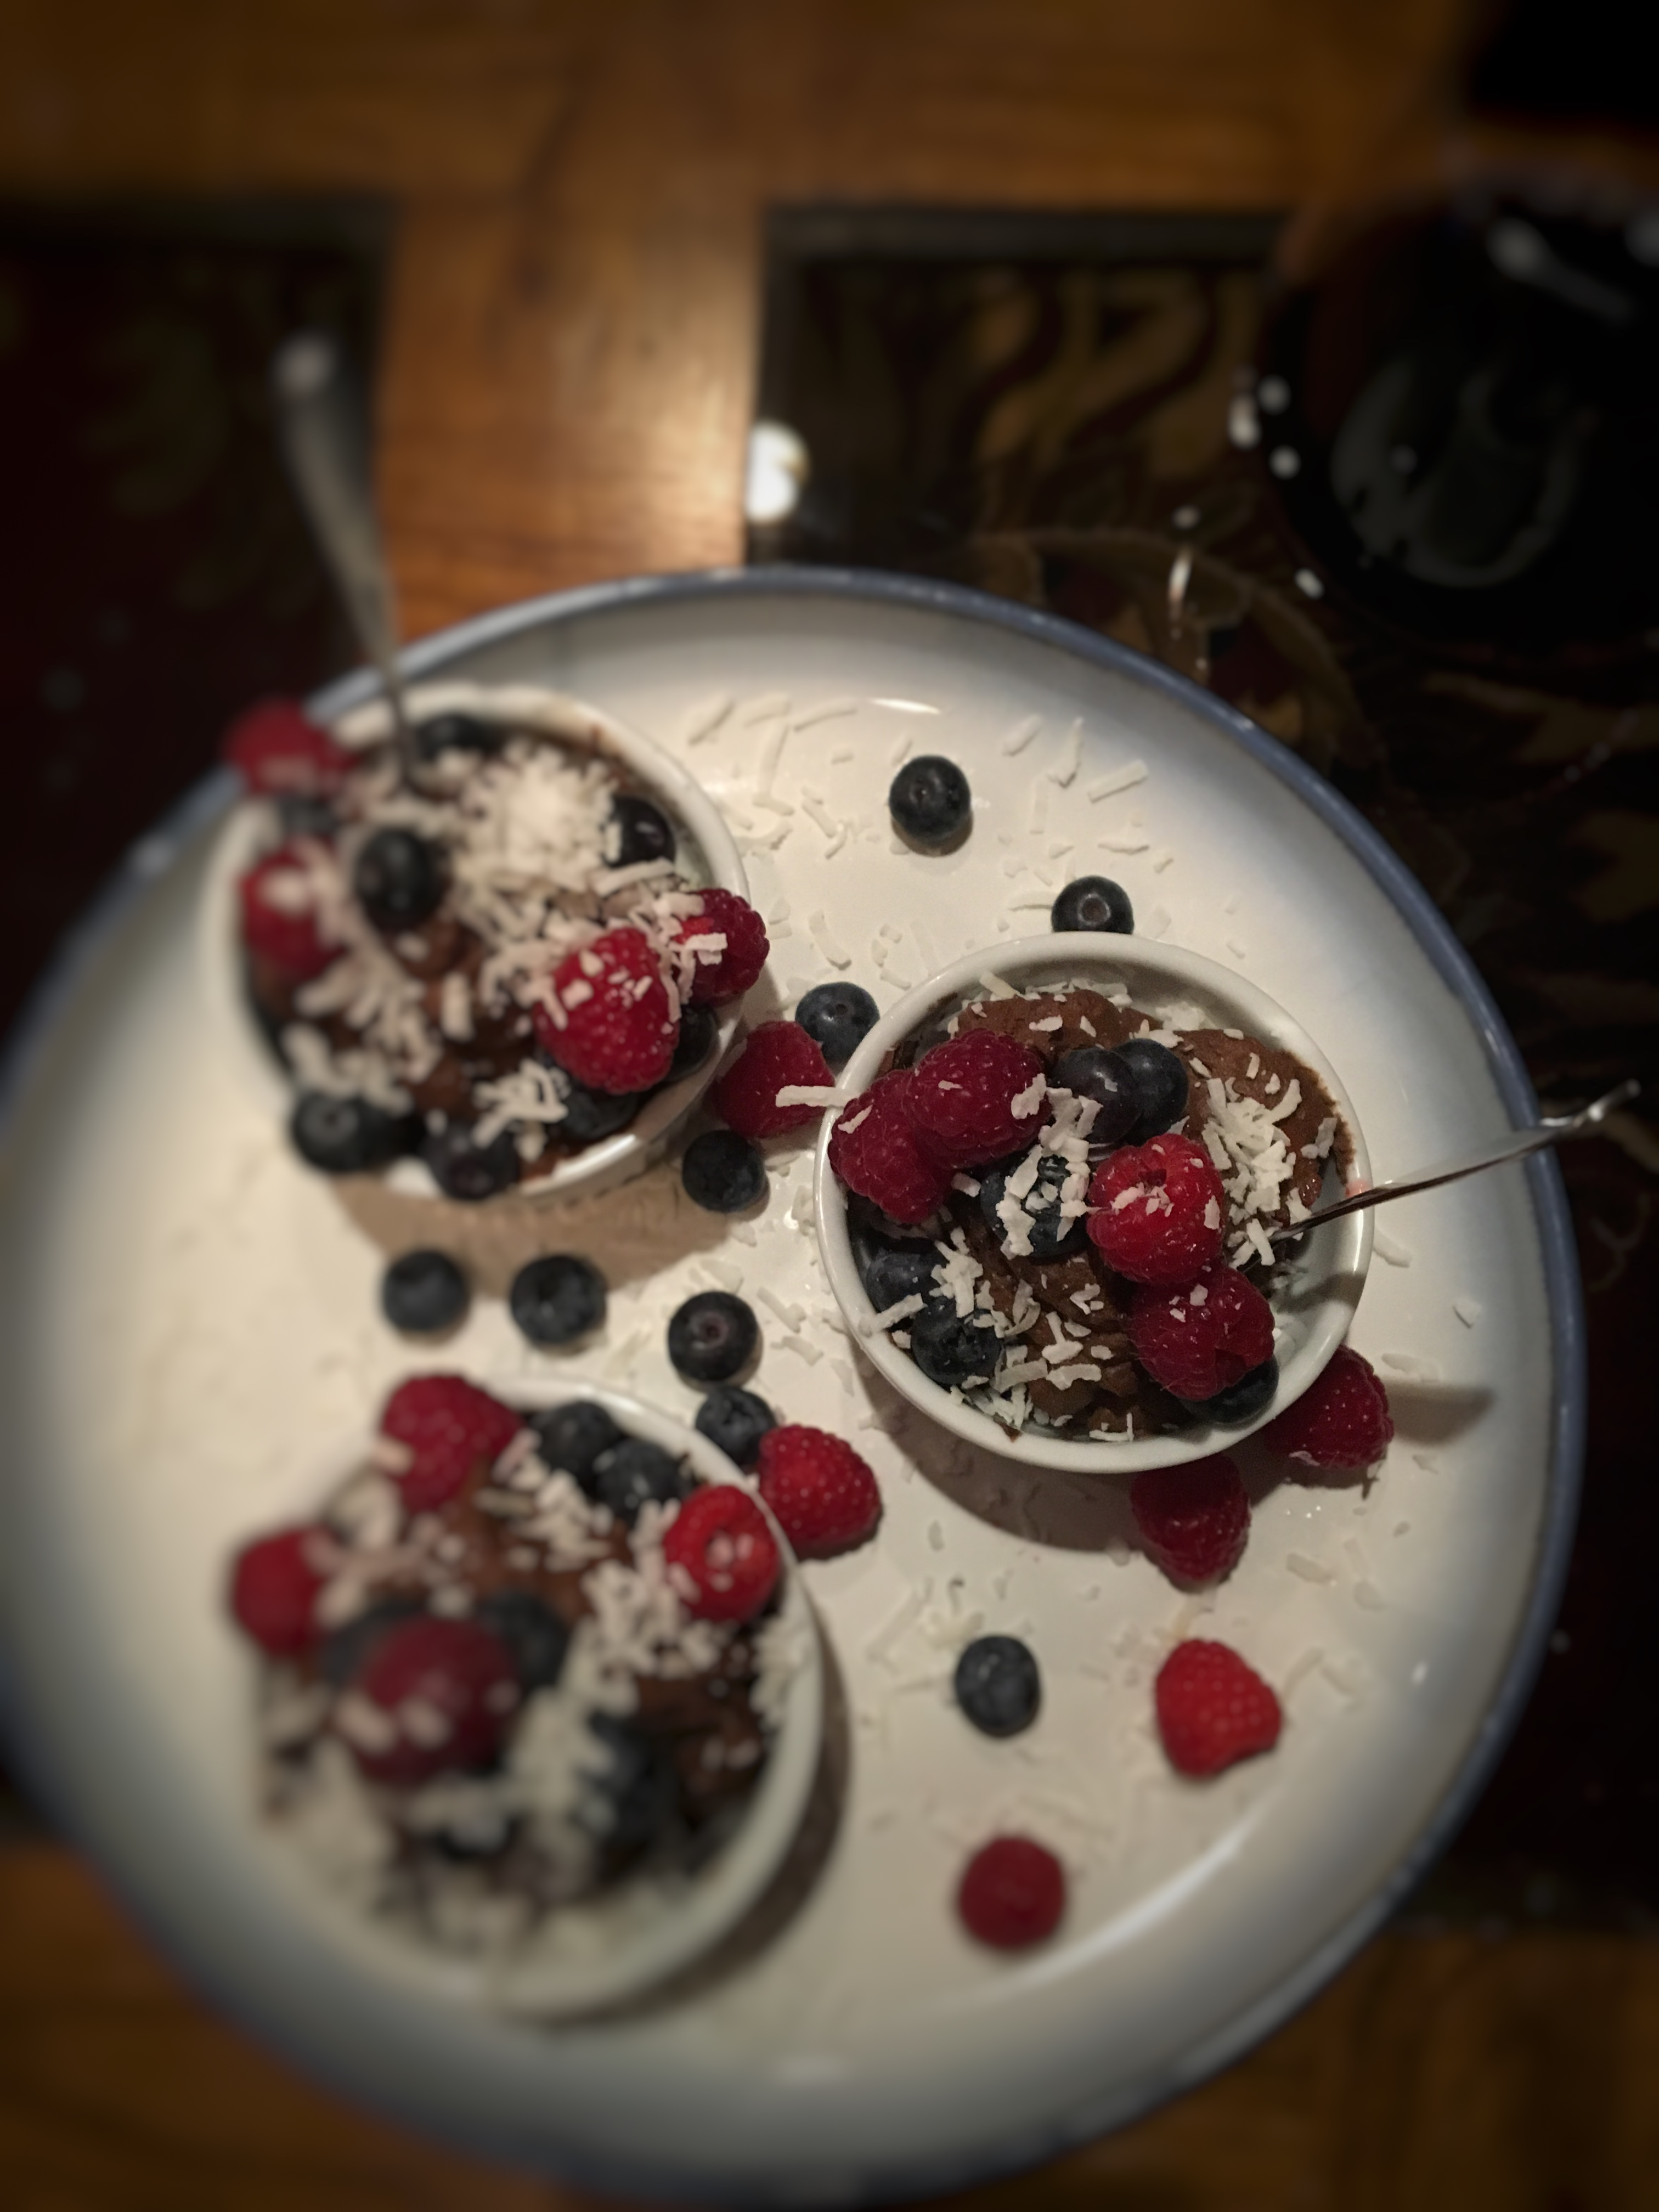 Vegan Dark Chocolate Mousse for Valentine's Day   Tina Marinaccio